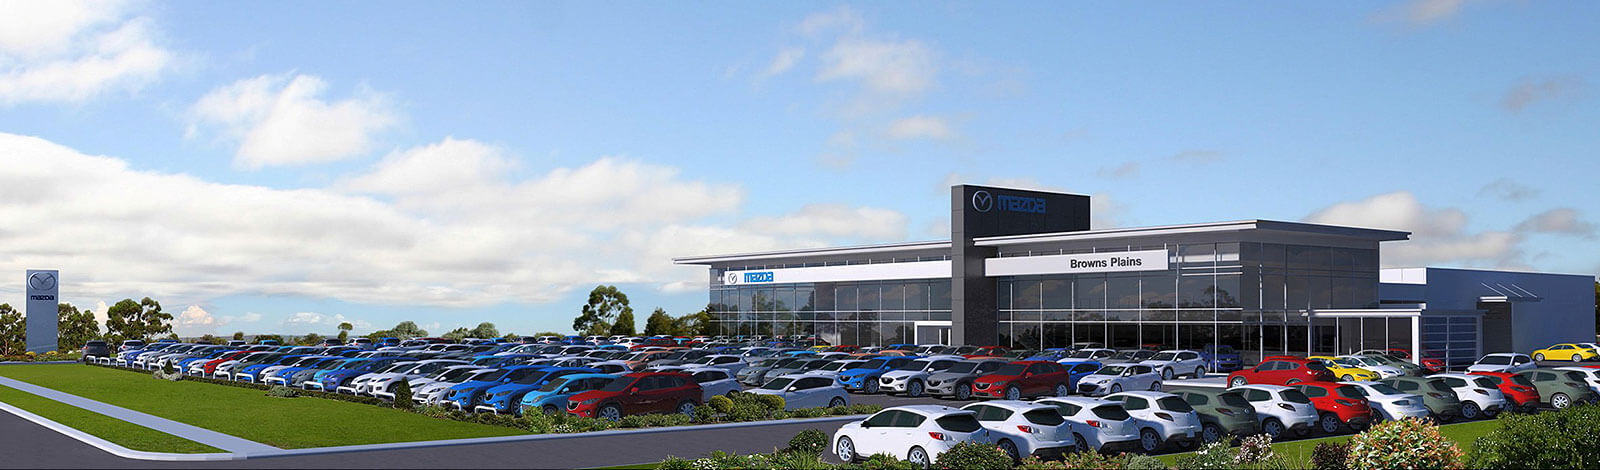 AHG to open new Mazda dealership